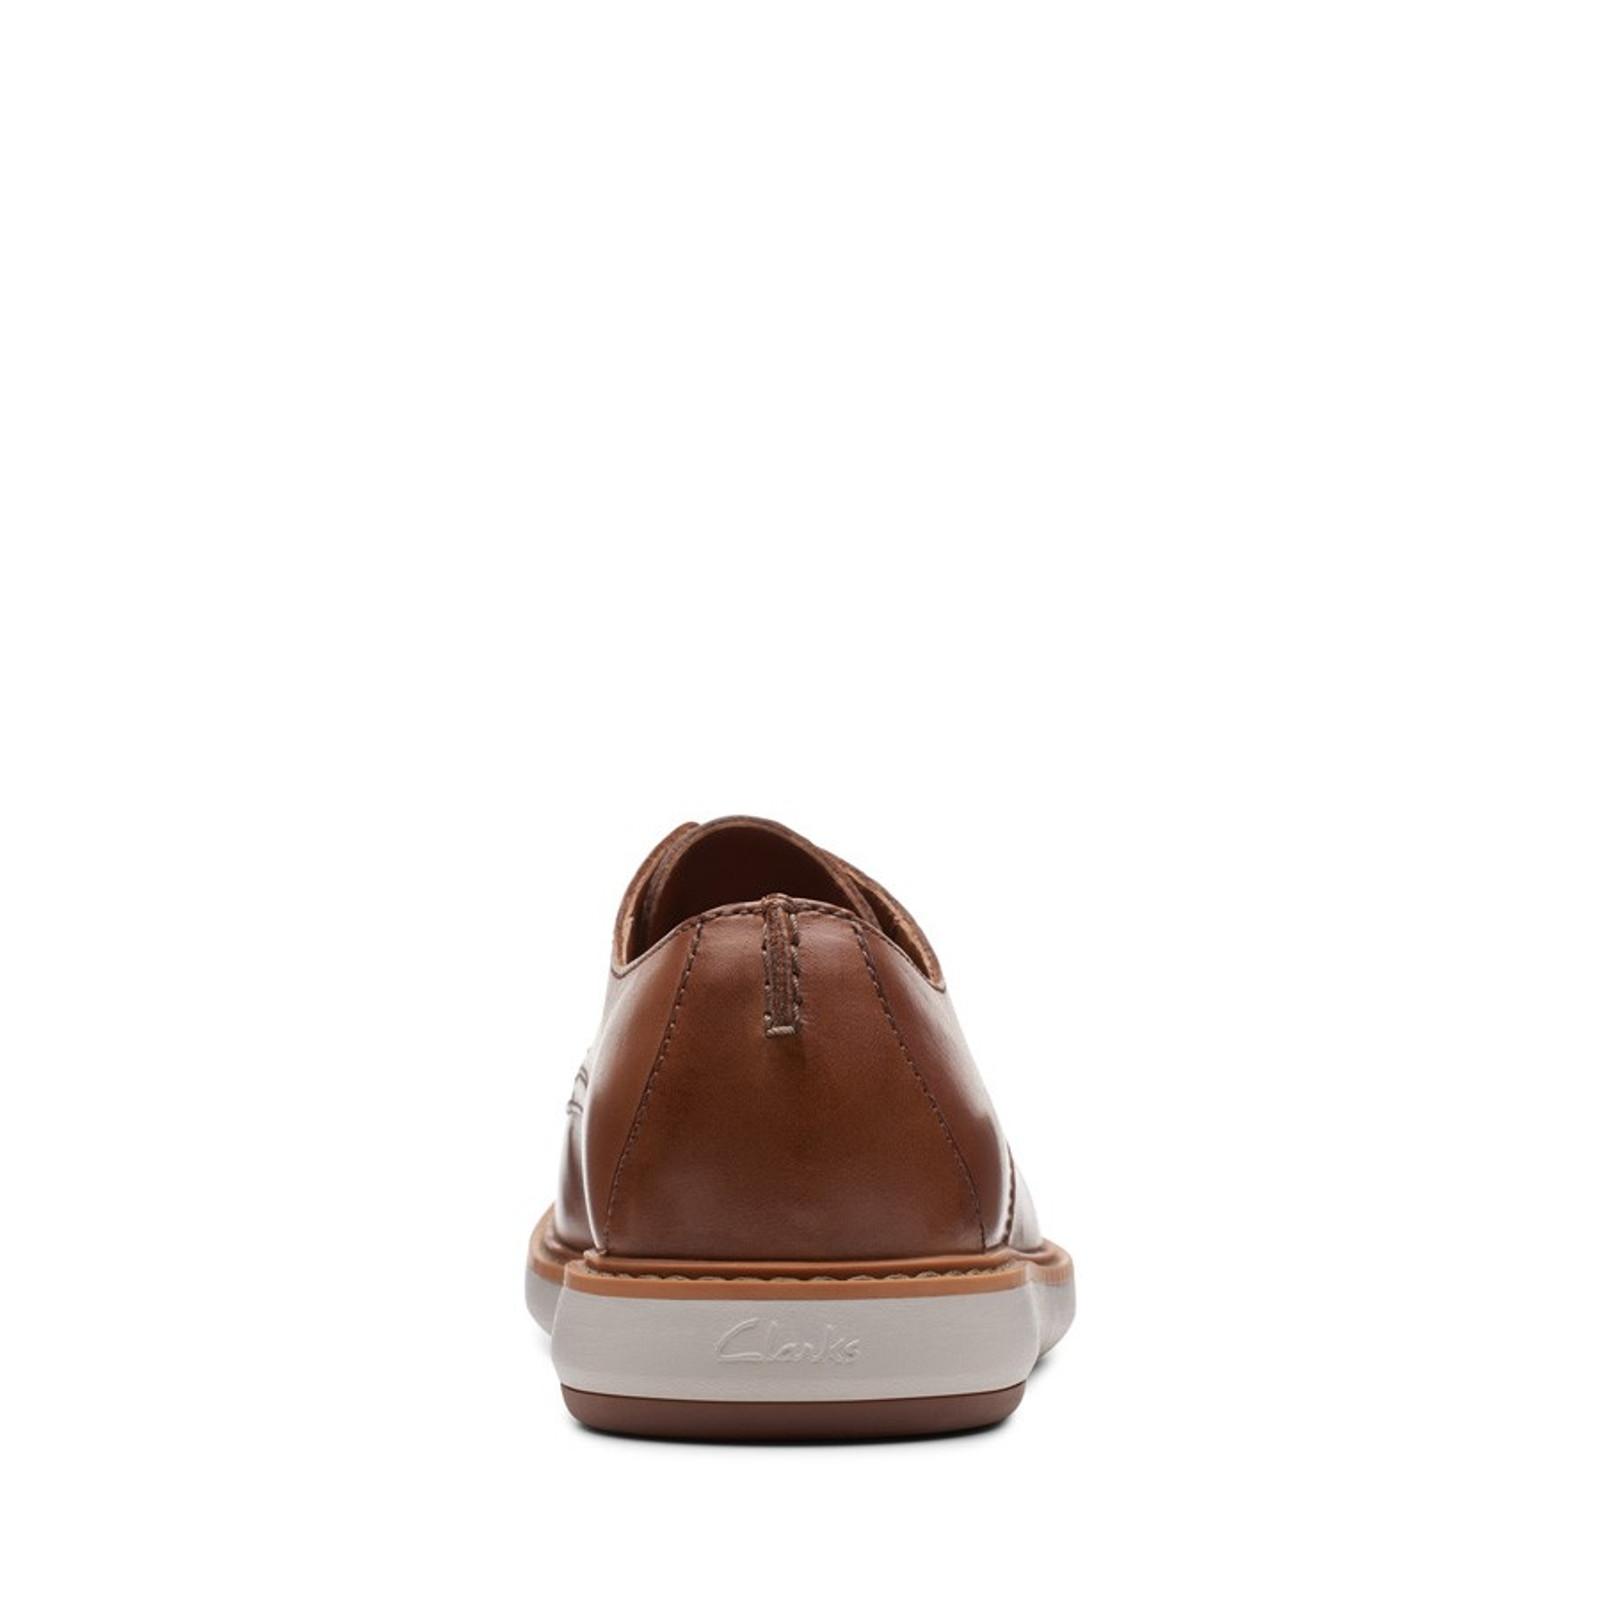 Clarks Mens DRAPER LACE Tan Leather